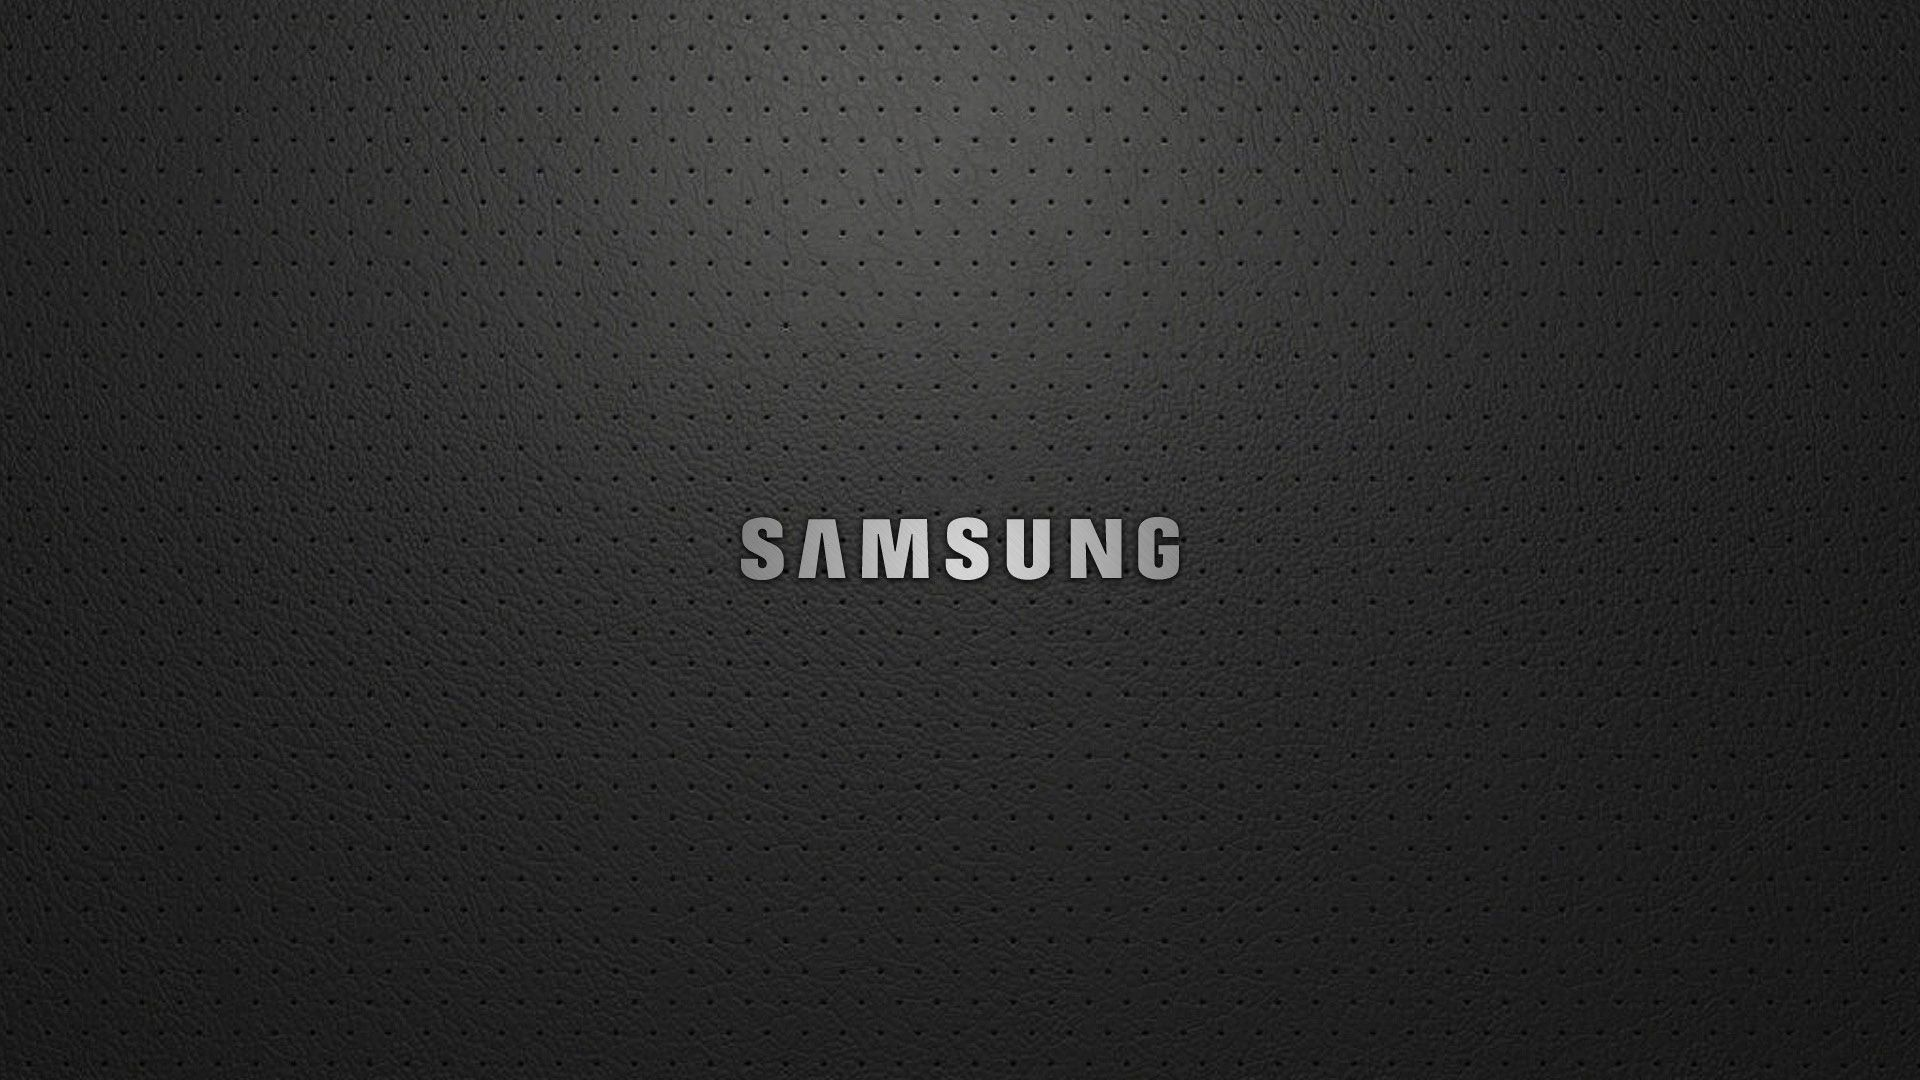 Most Inspiring Wallpaper High Resolution Samsung - c515d45cd4530a5c1a68fa5008daf858  Snapshot_547122.jpg